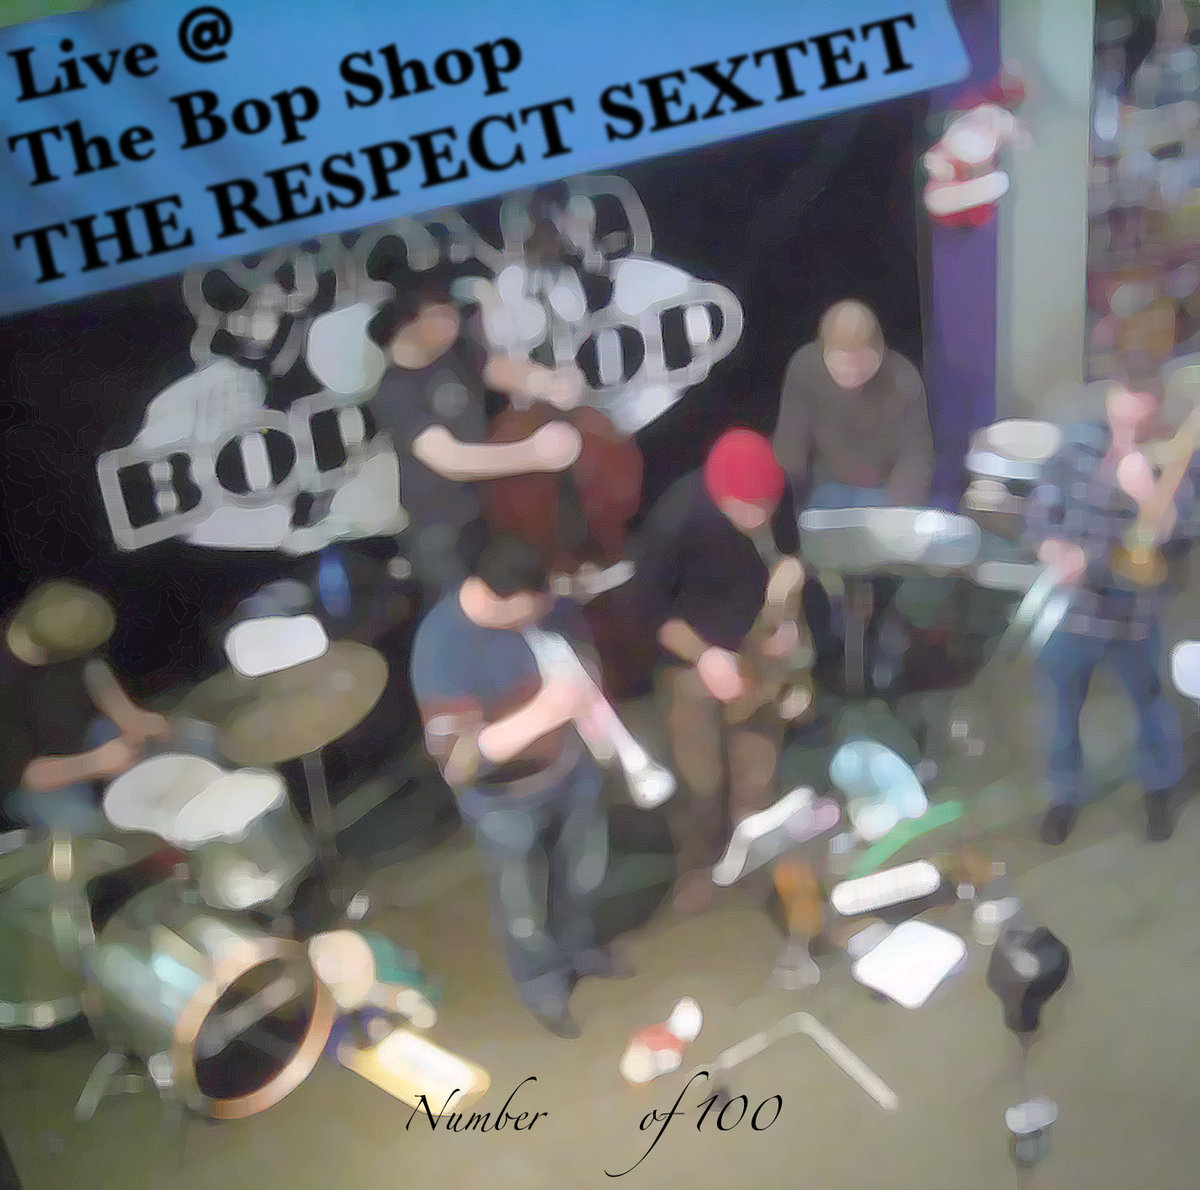 Live at The Bop Shop (The Respect Sextet, 2008)